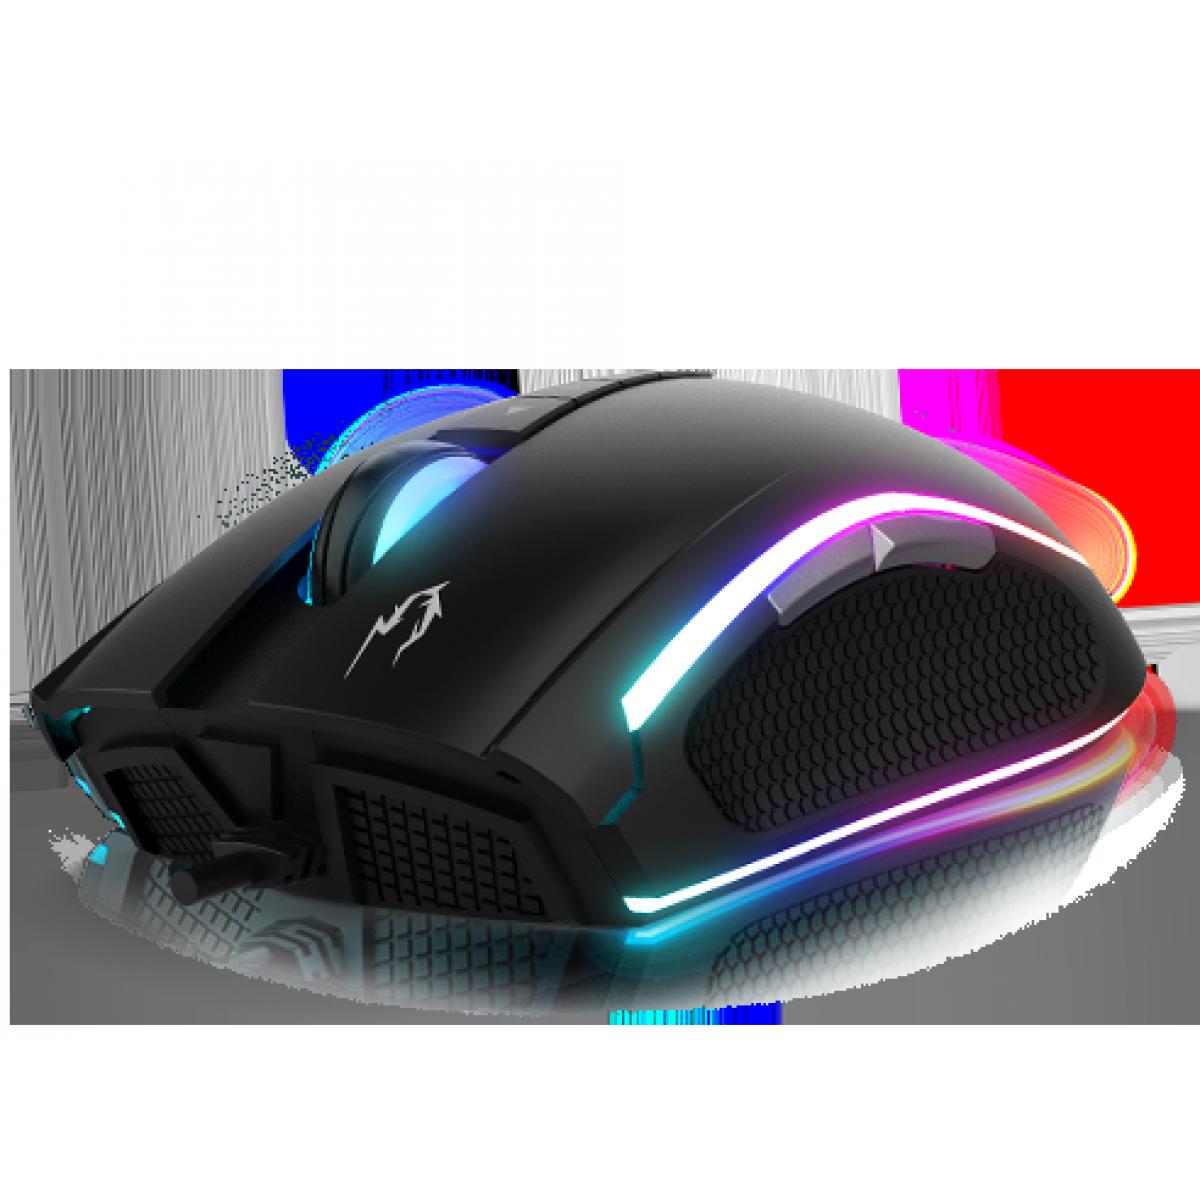 Kit MousePad NYX E1 + Mouse Gamer Gamdias Zeus M2 RGB, 10,800 DPI, 8 Botões Programáveis, Black